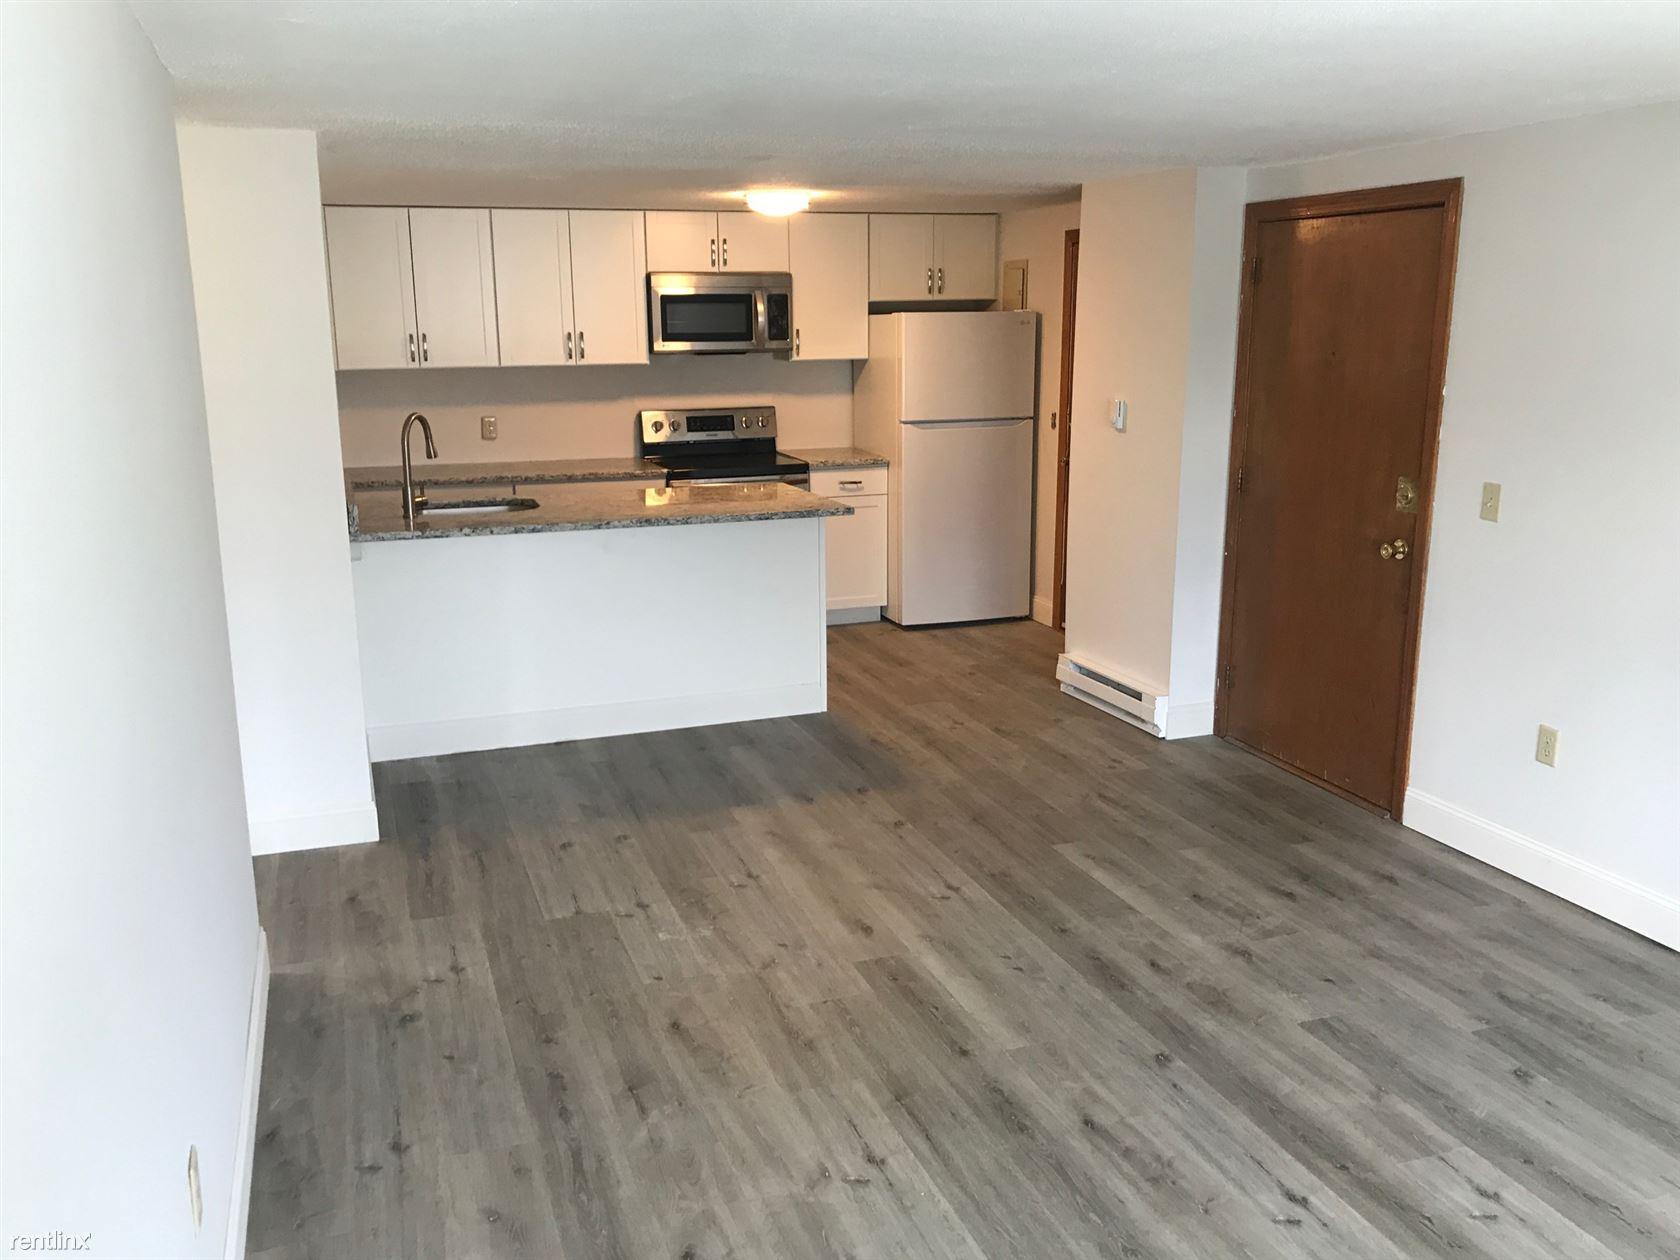 106 Friend St, Amesbury, MA - $1,650 USD/ month